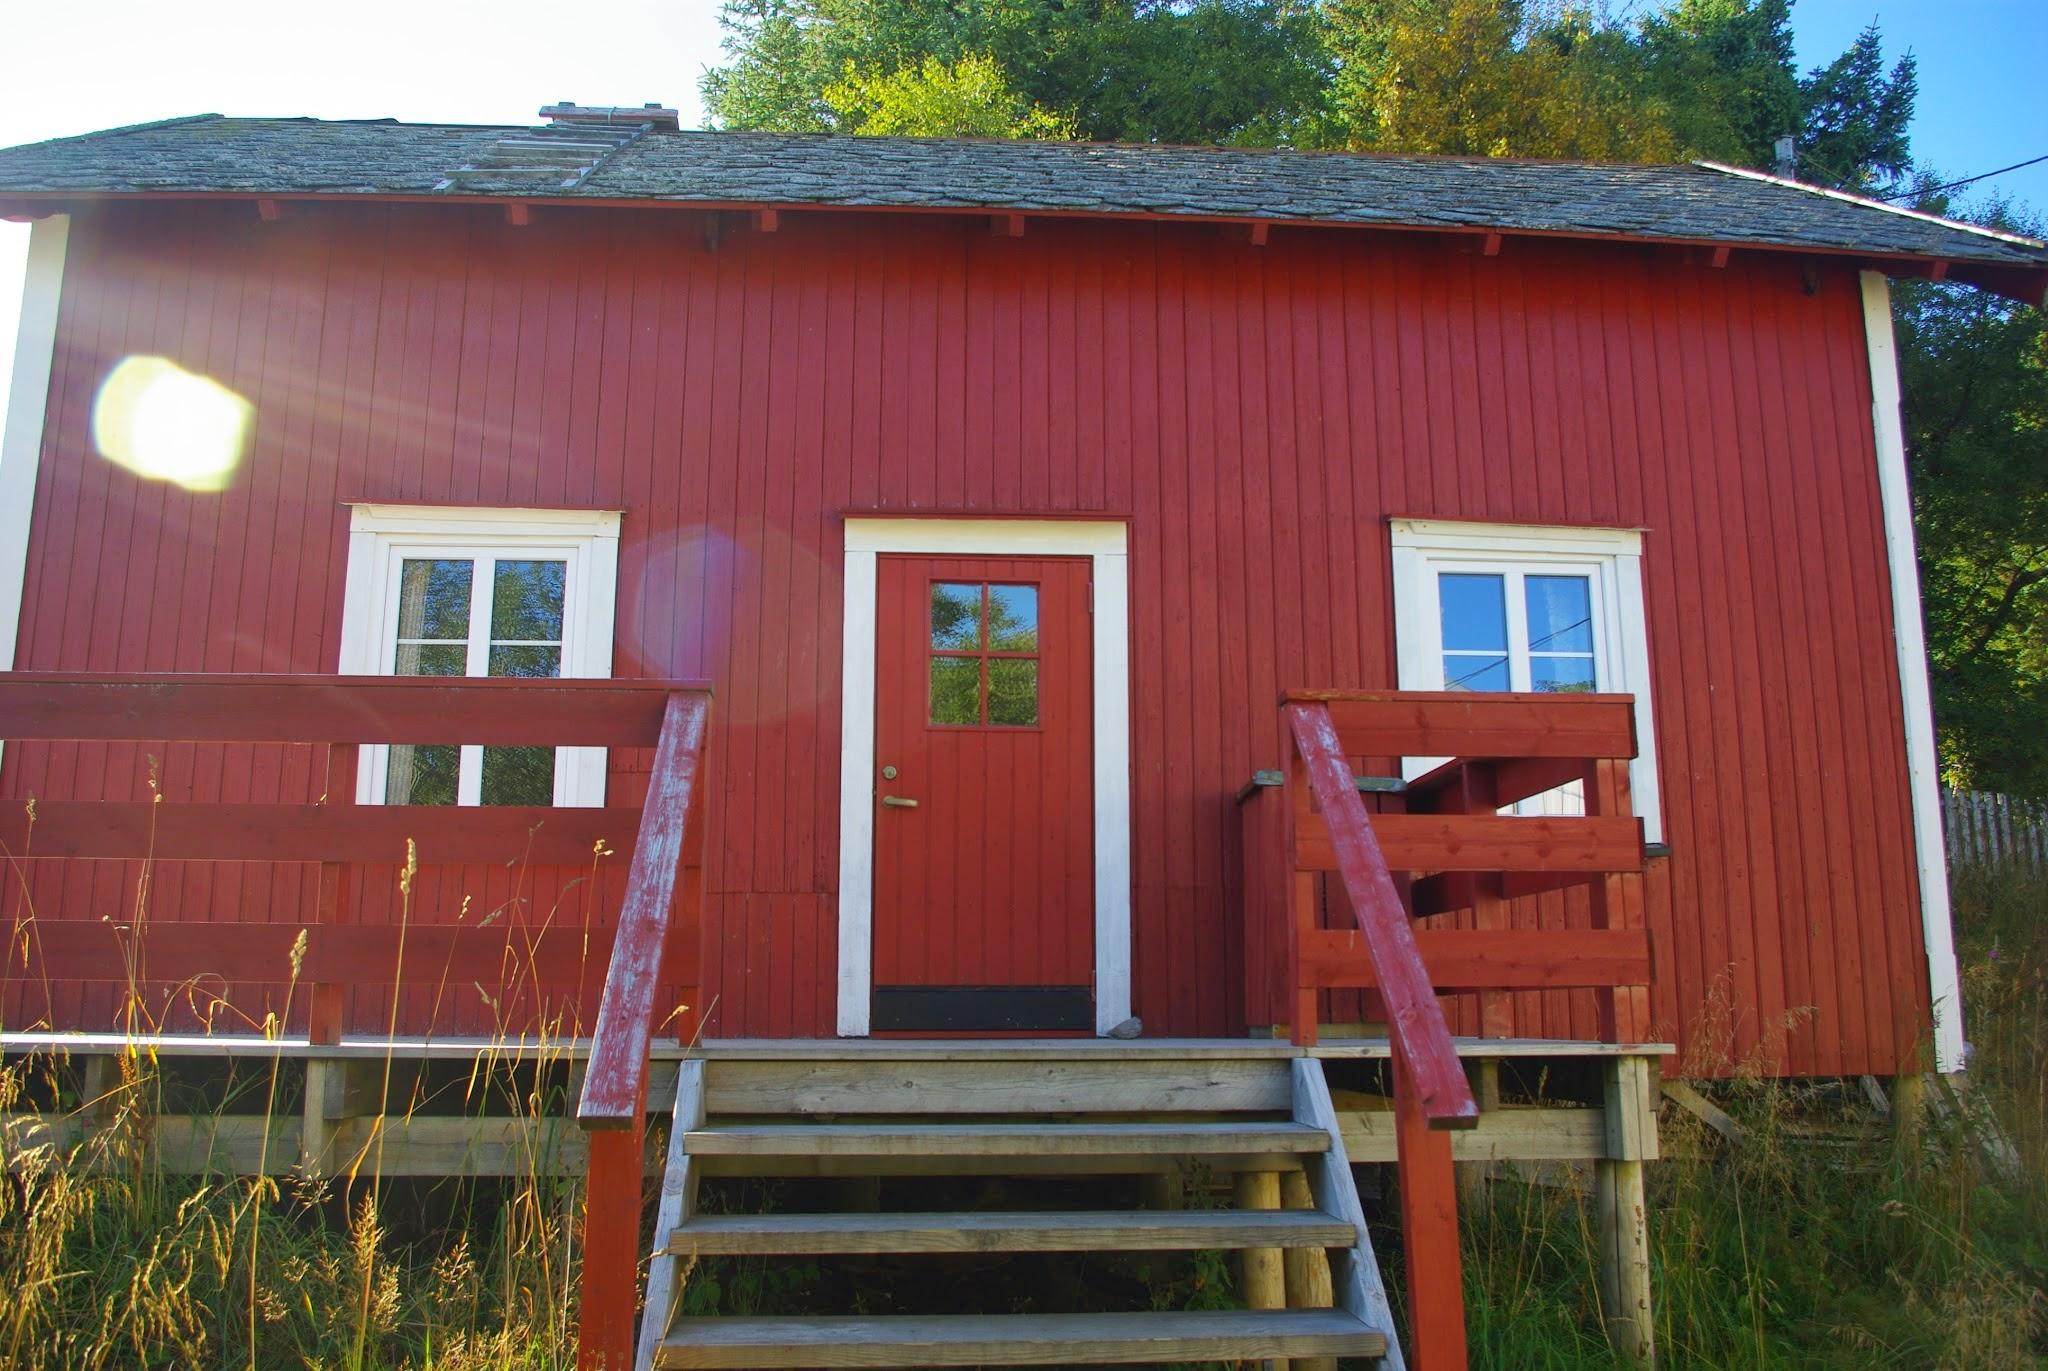 Our hostel digs in Å. Classic Scandinavian red rectangular cabin.